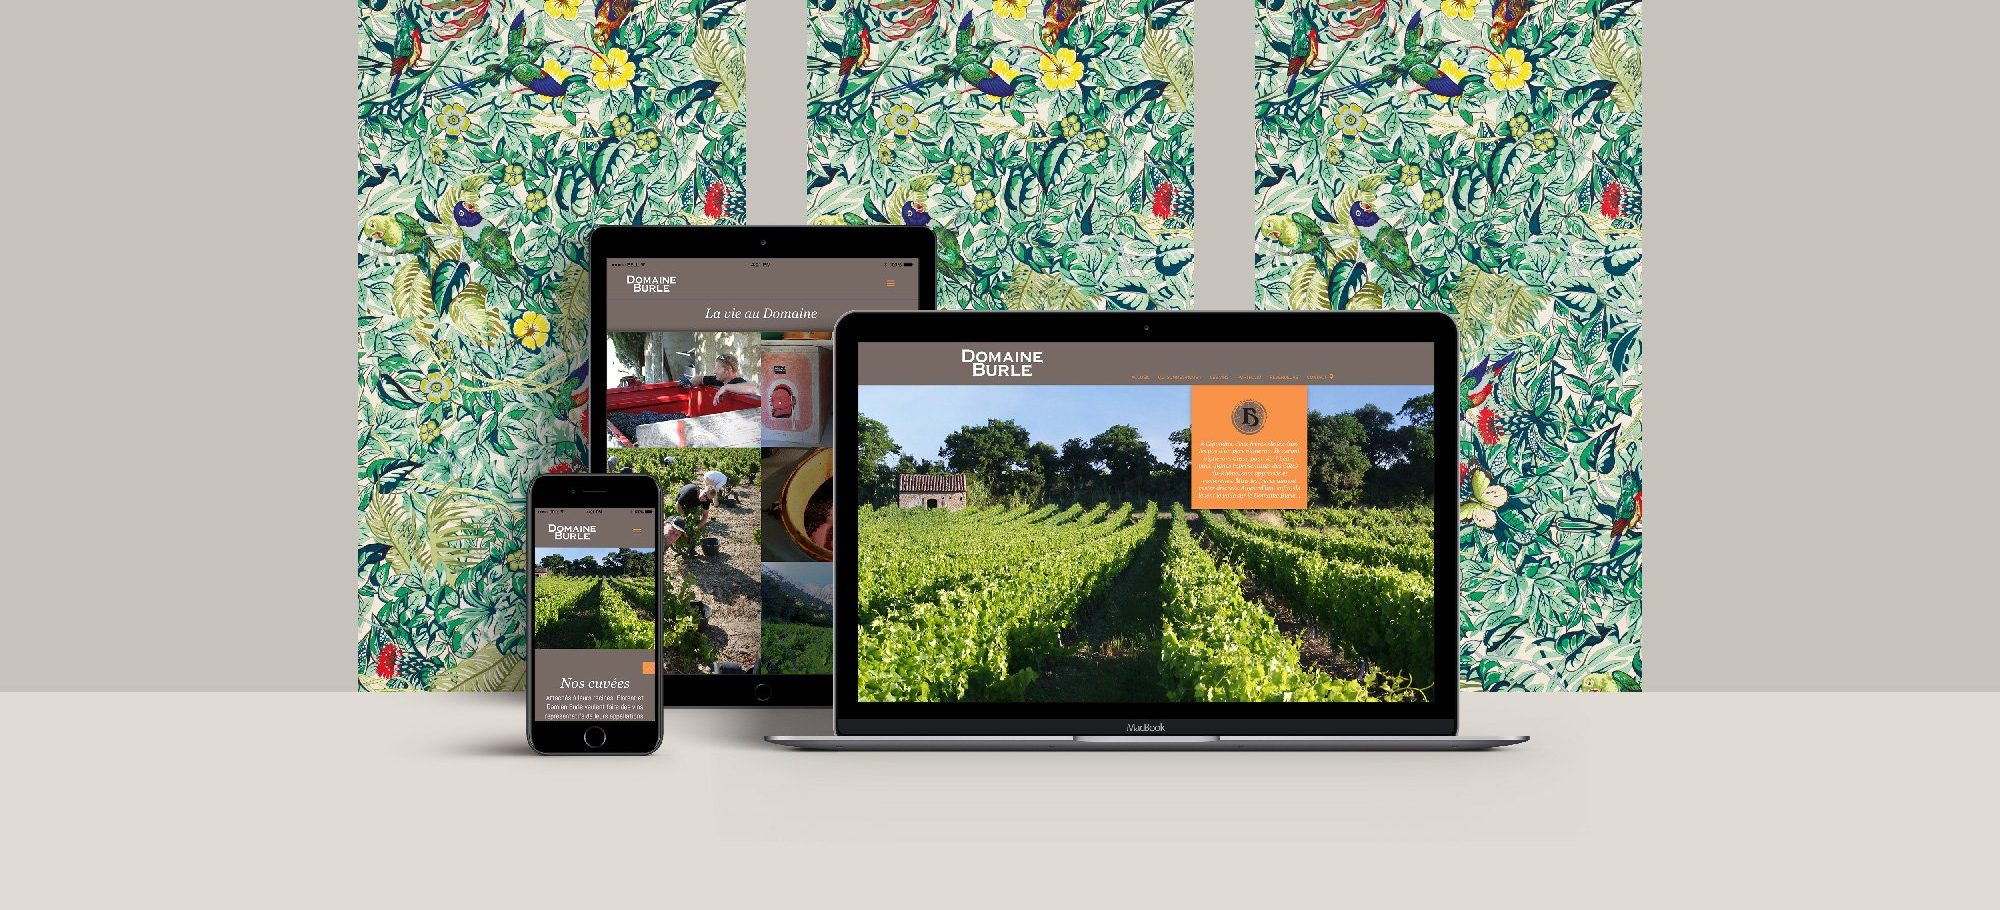 burle-vins-web-valerie-mersier-responsive